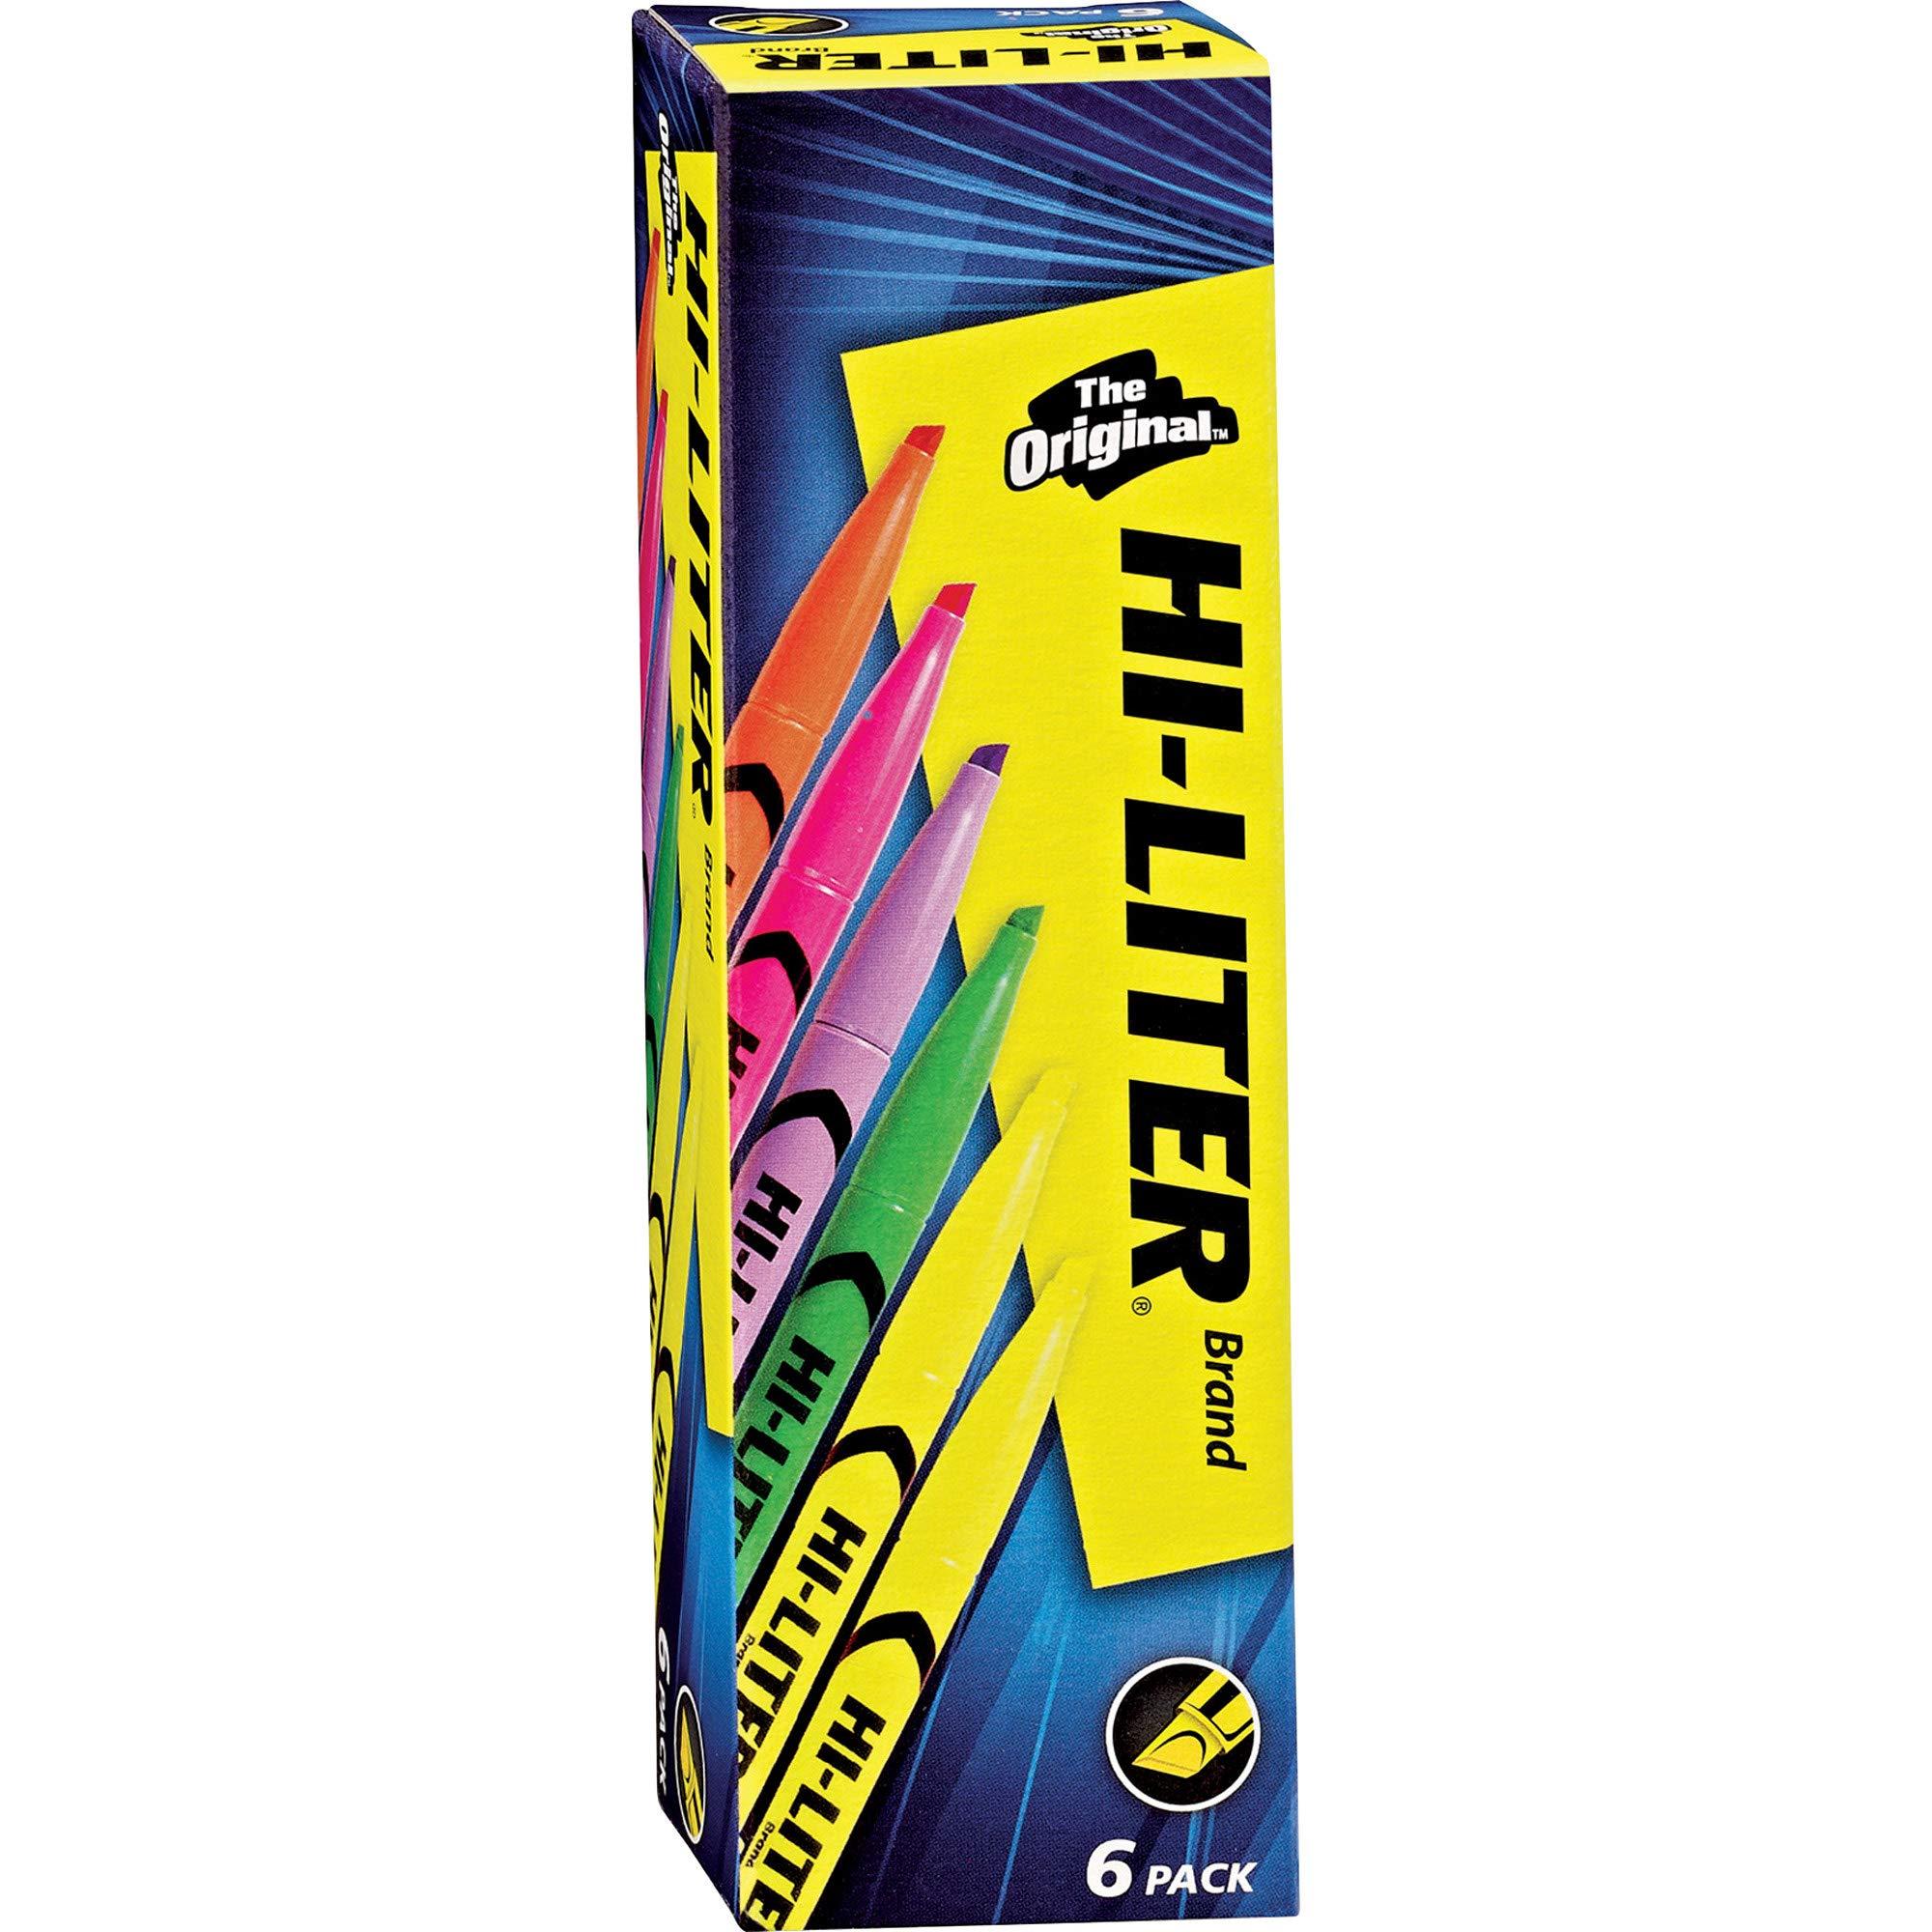 Avery Hi-Liter Pen-Style Highlighters, Smear Safe Ink, Chisel Tip, 6 Assorted Color Highlighters (23565)